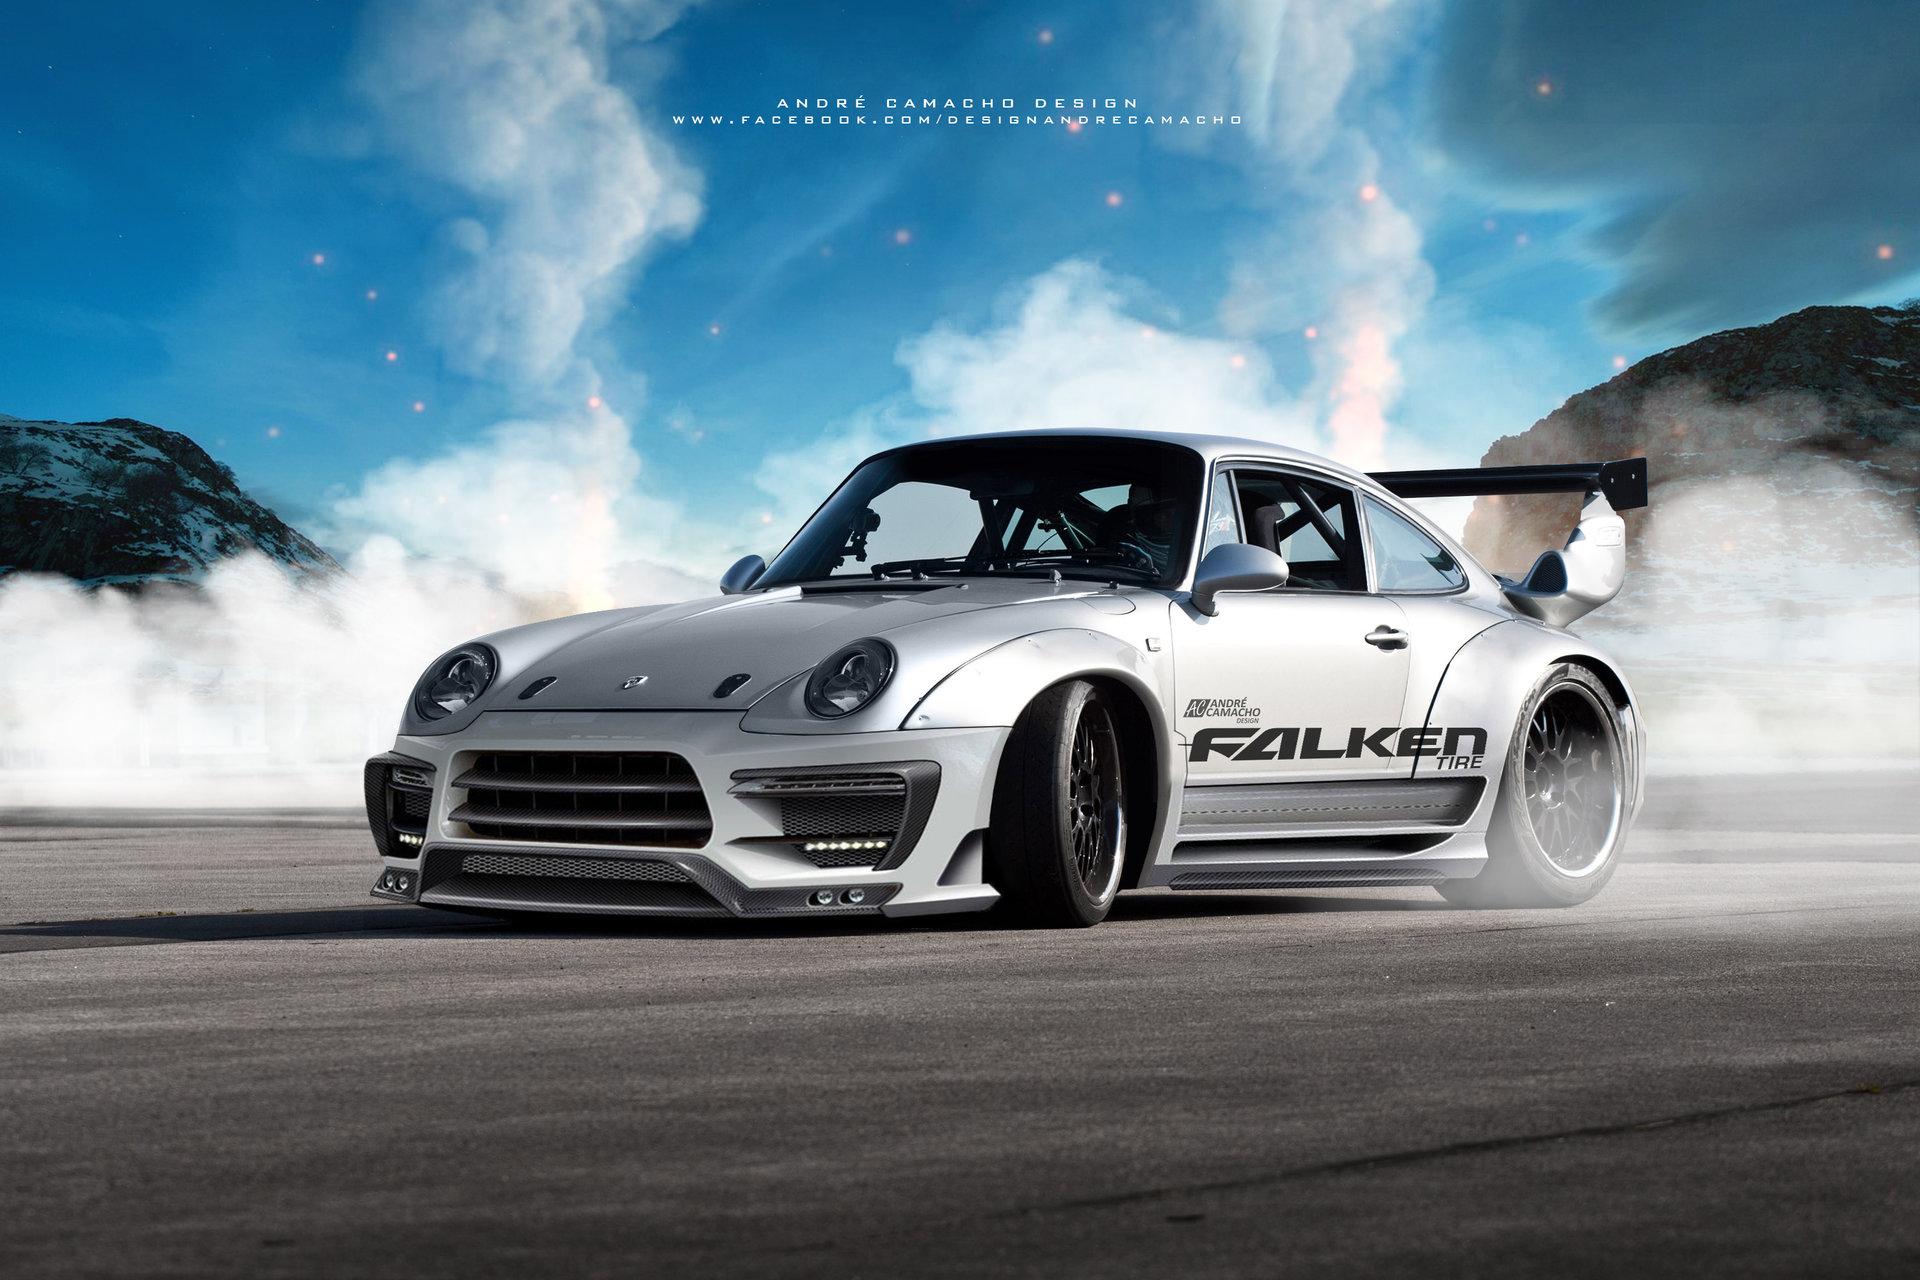 Andre Camacho Design Porsche 993 Gt2 Turbo